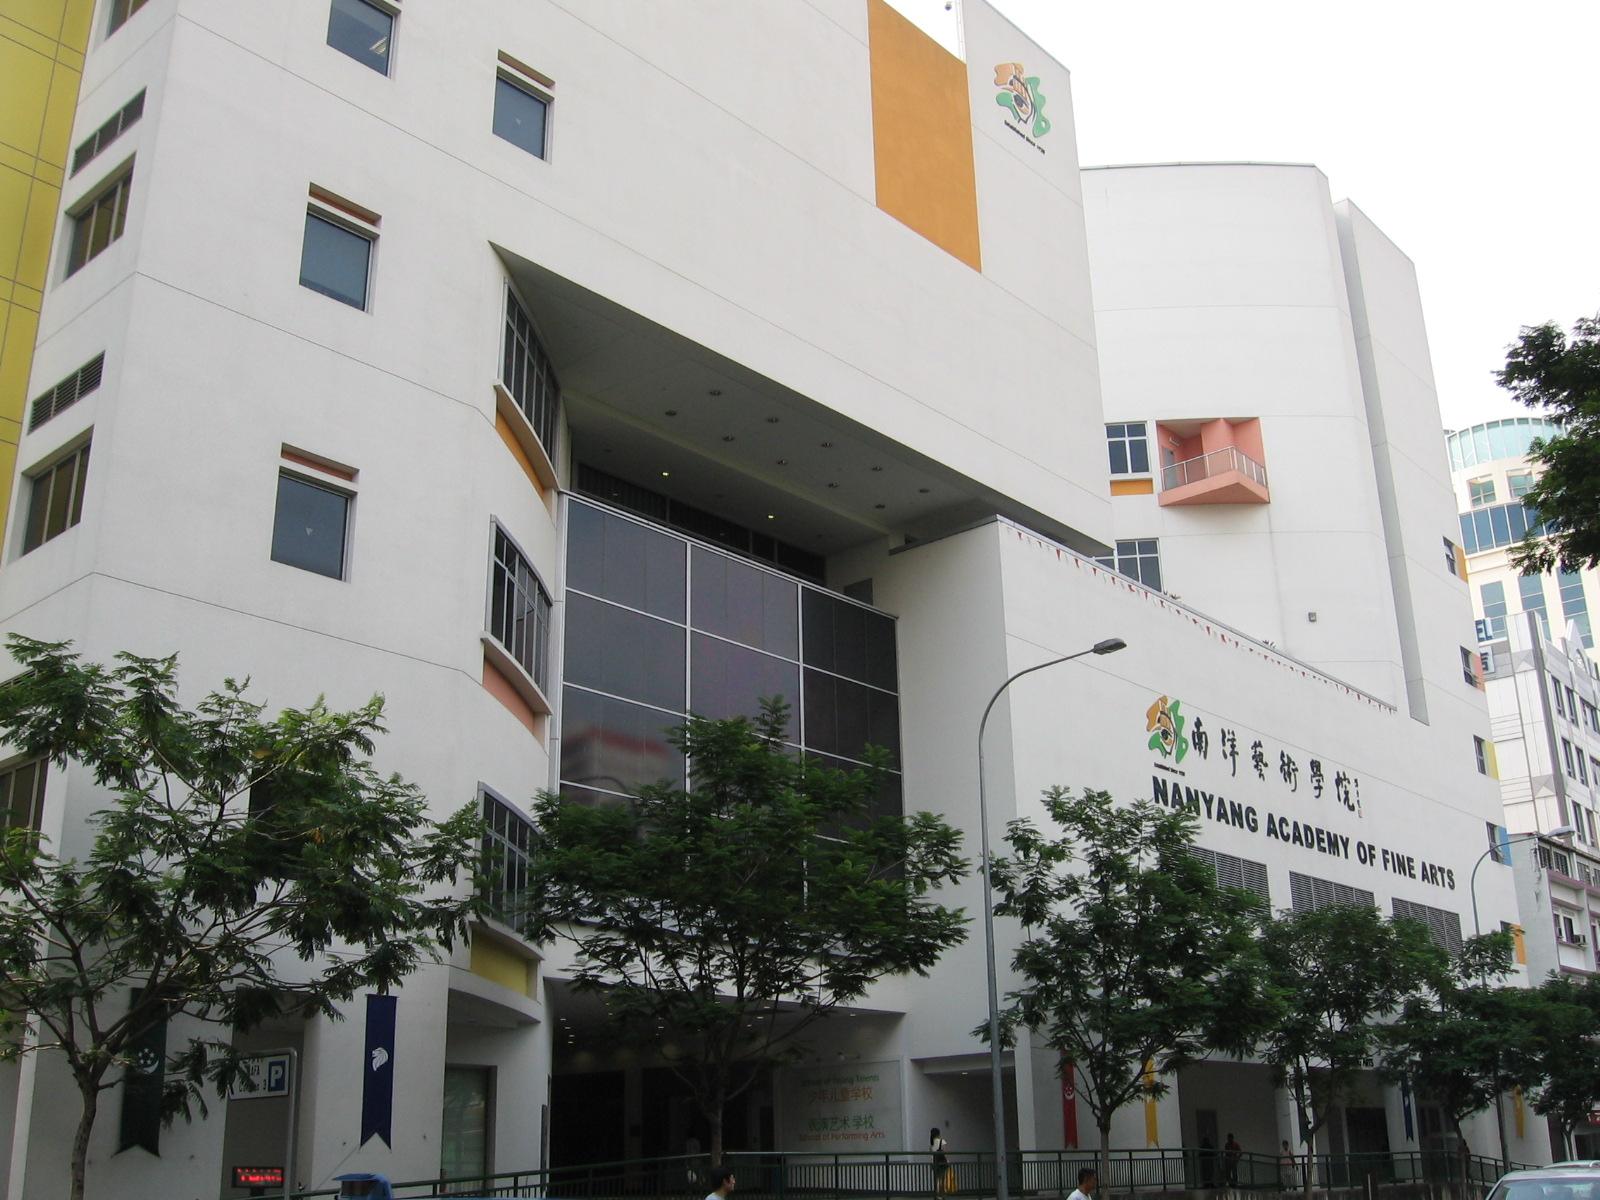 Nanyang Academy of Fine Arts (NAFA)